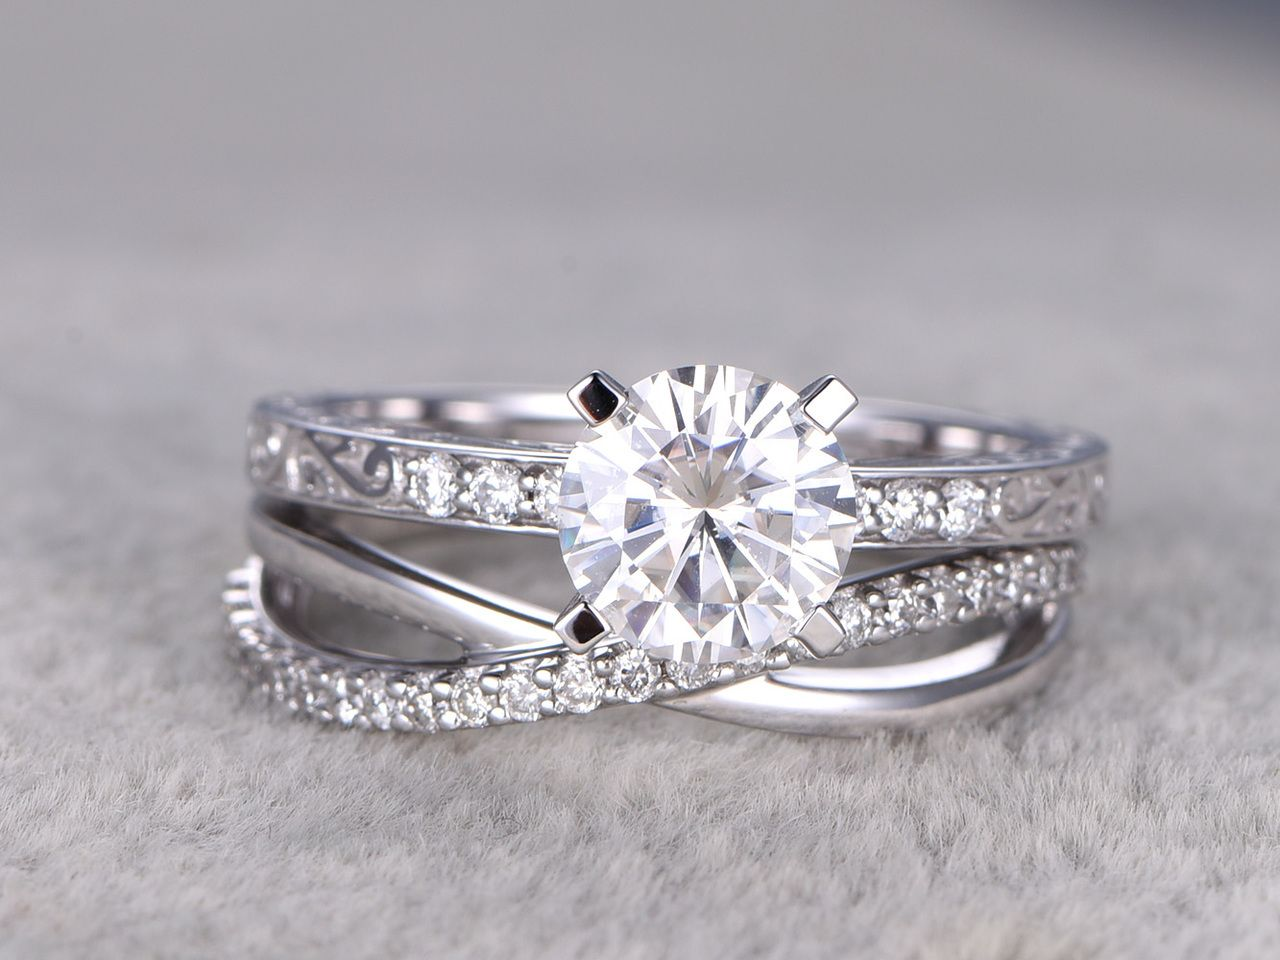 2pcs Moissanite Wedding Ring Set Diamond Matching Band